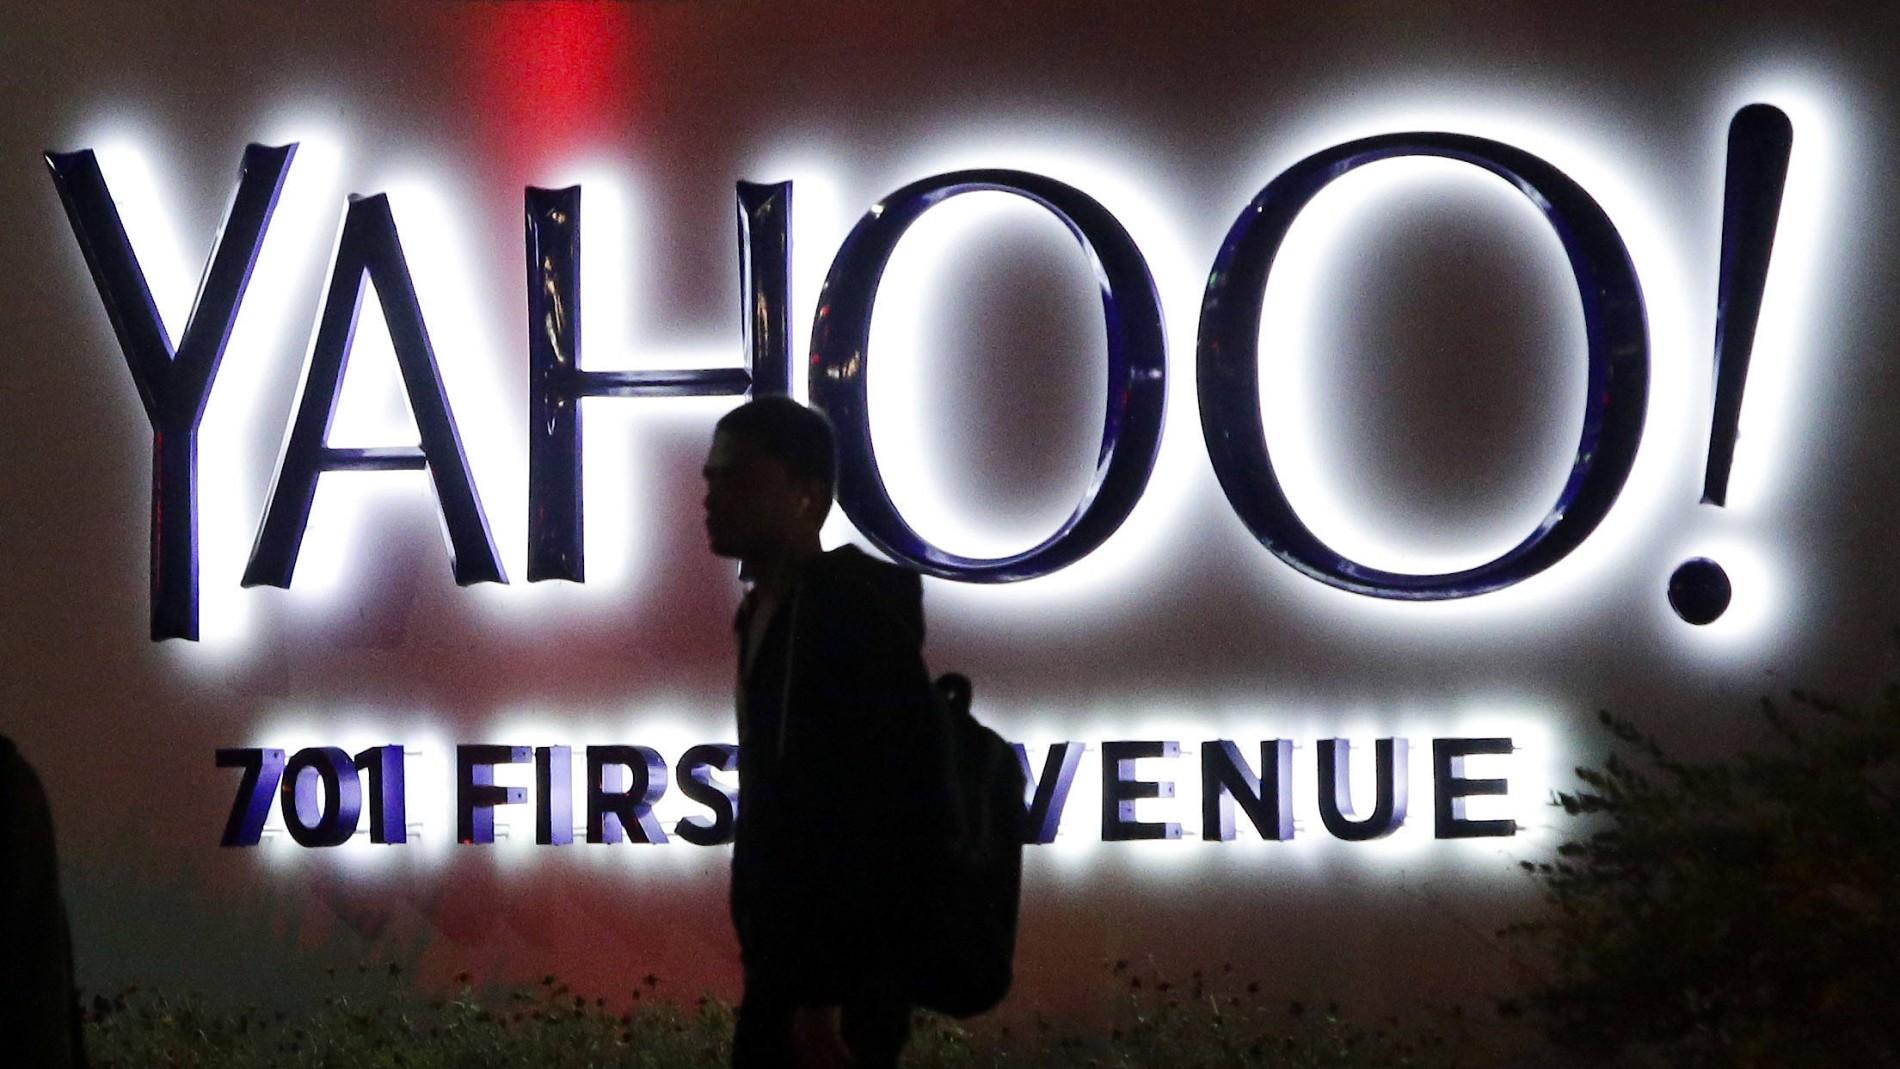 US-Telekom-Konzern Verizon kauft Internetpionier Yahoo